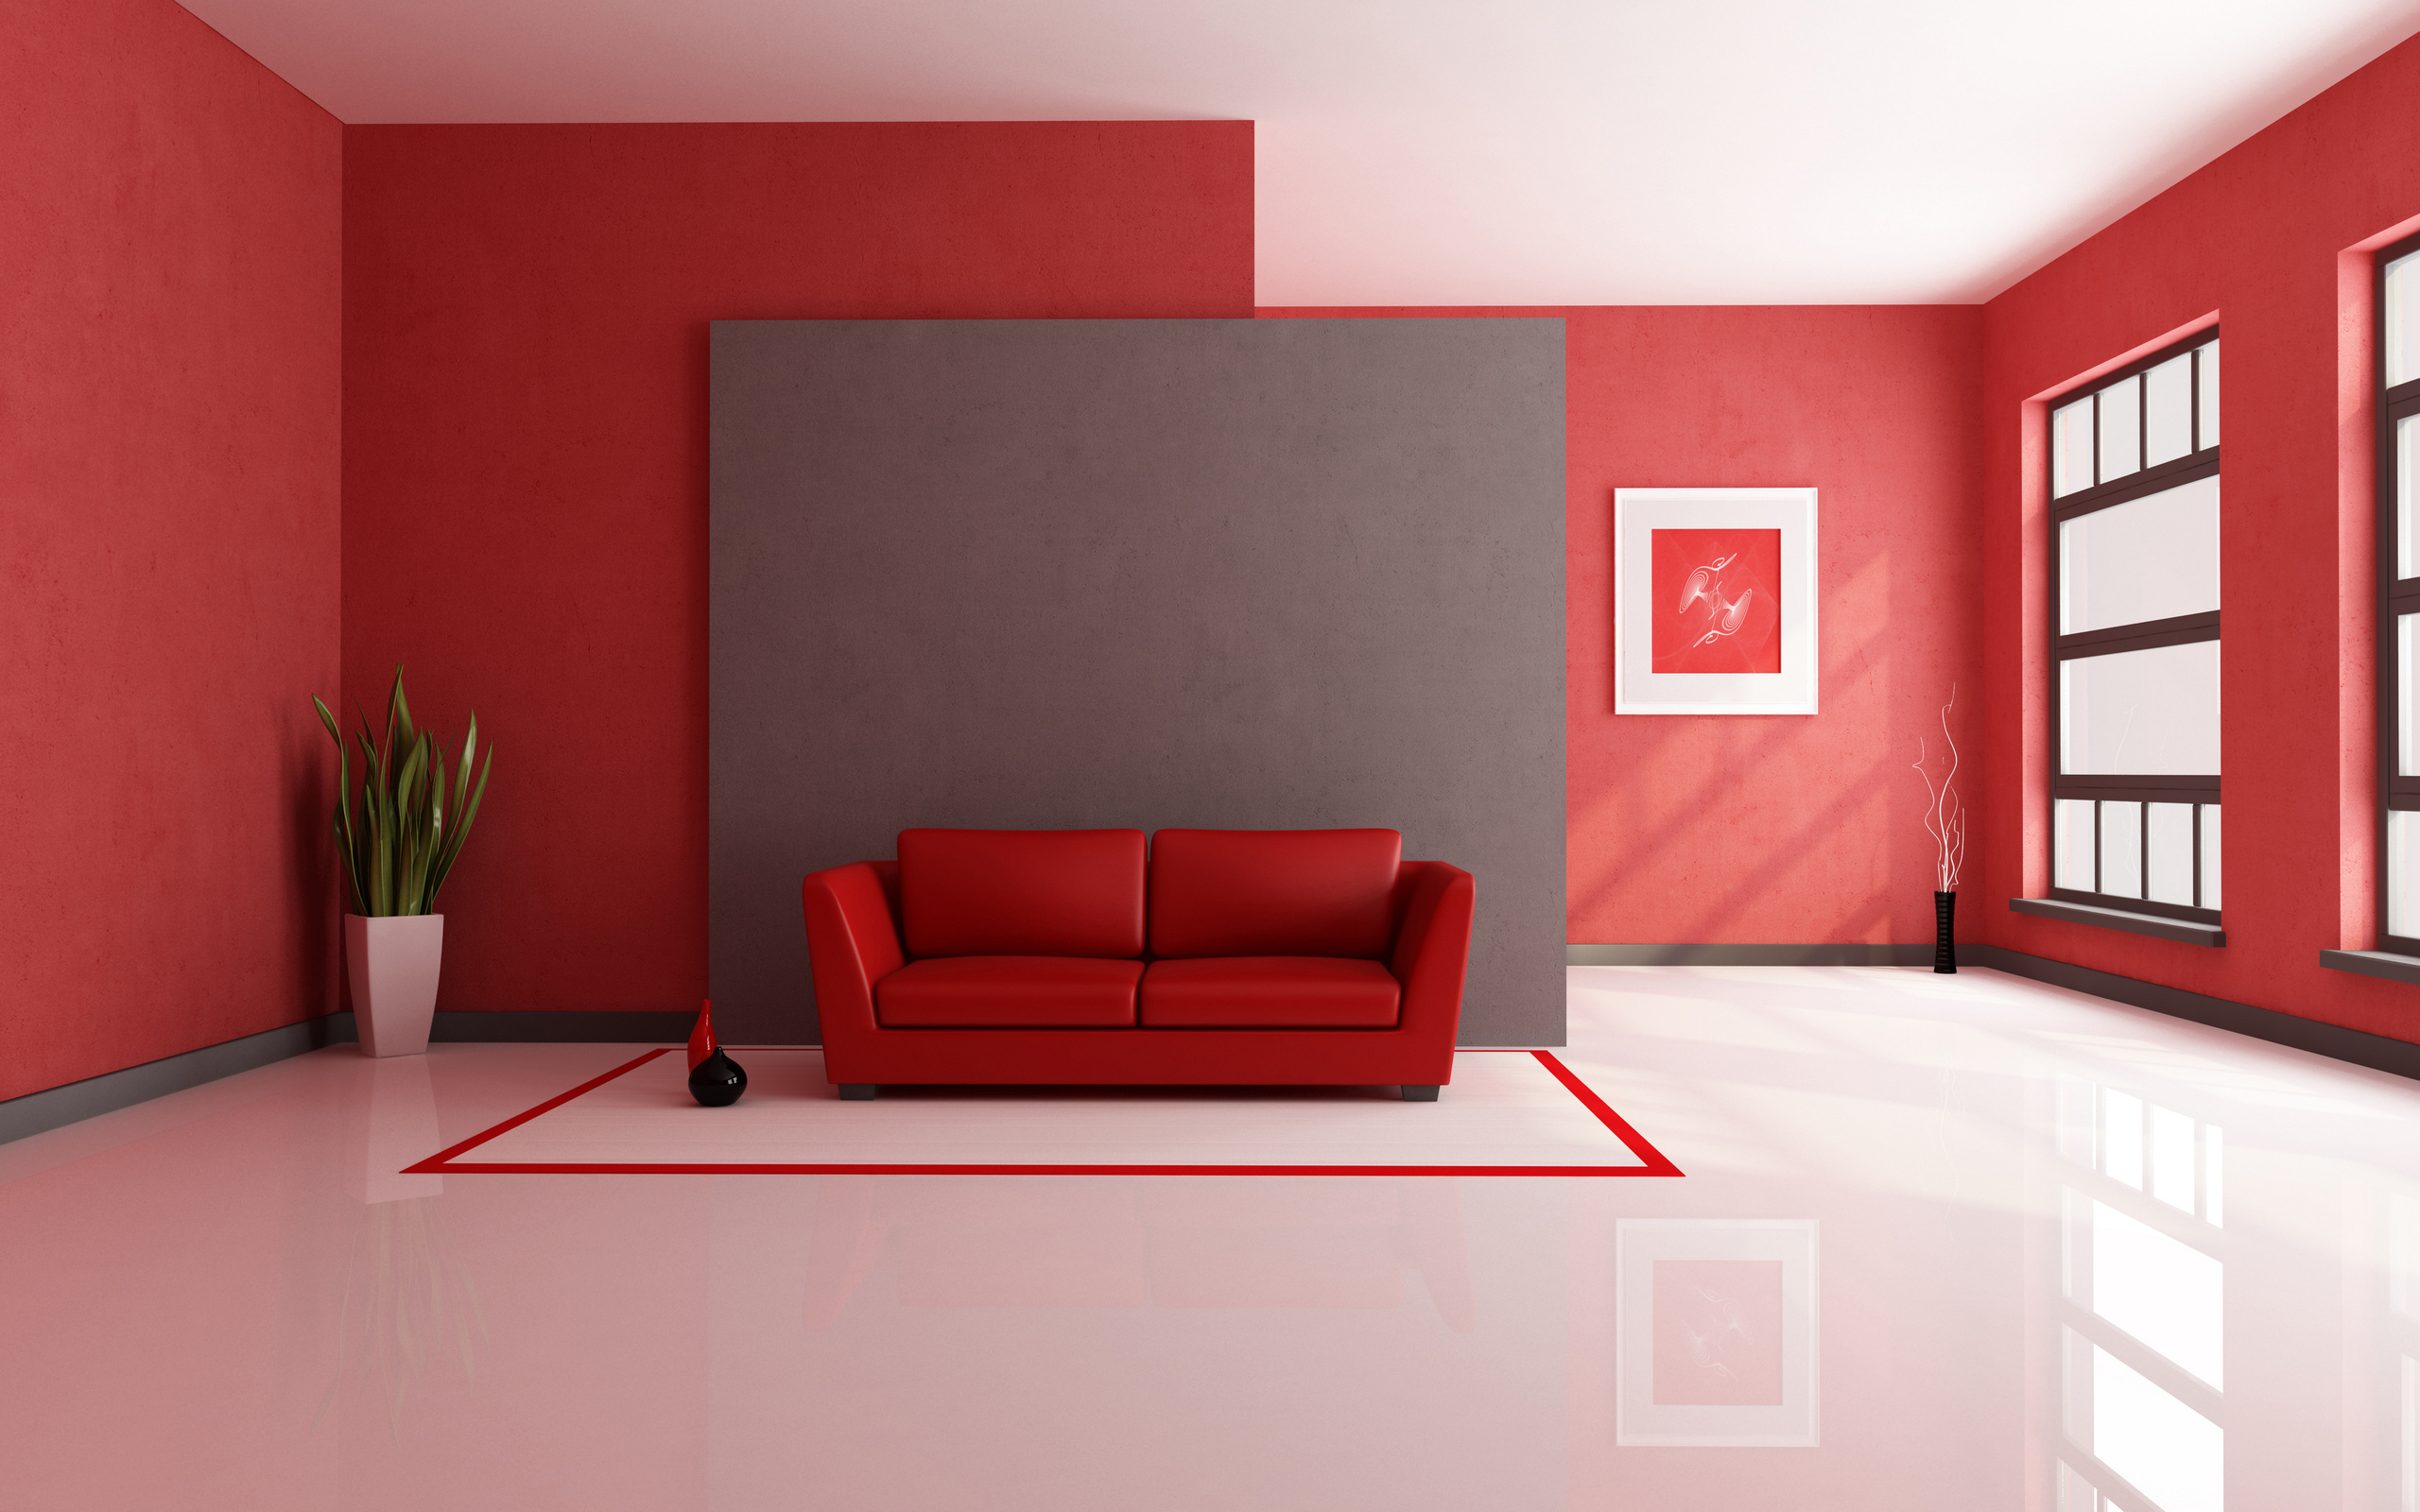 red_interior_design-wide